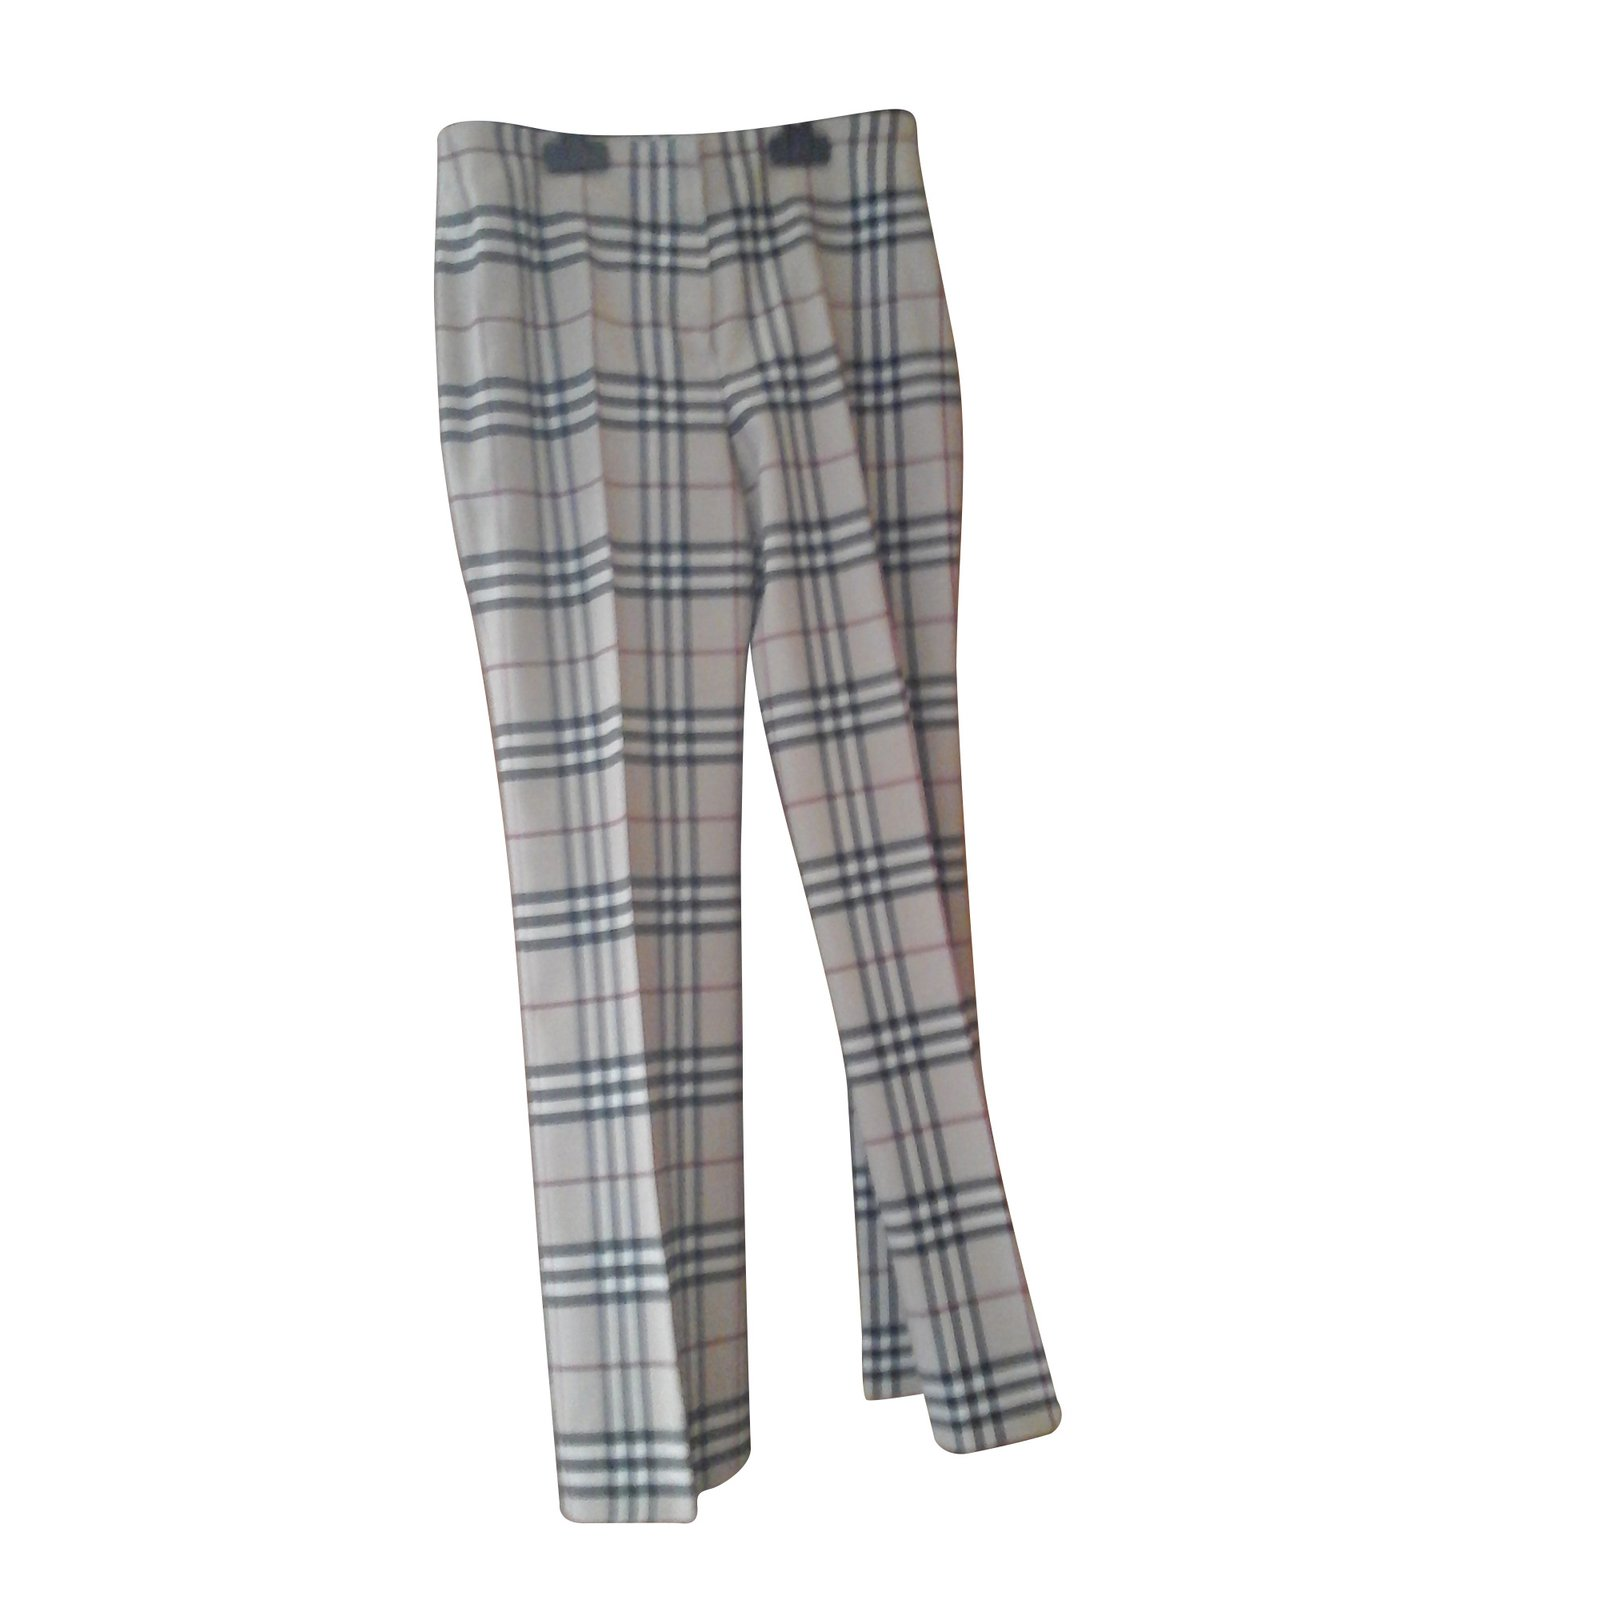 1984c36c79bfbc beige-burberry-trousers-pants-leggings.jpg